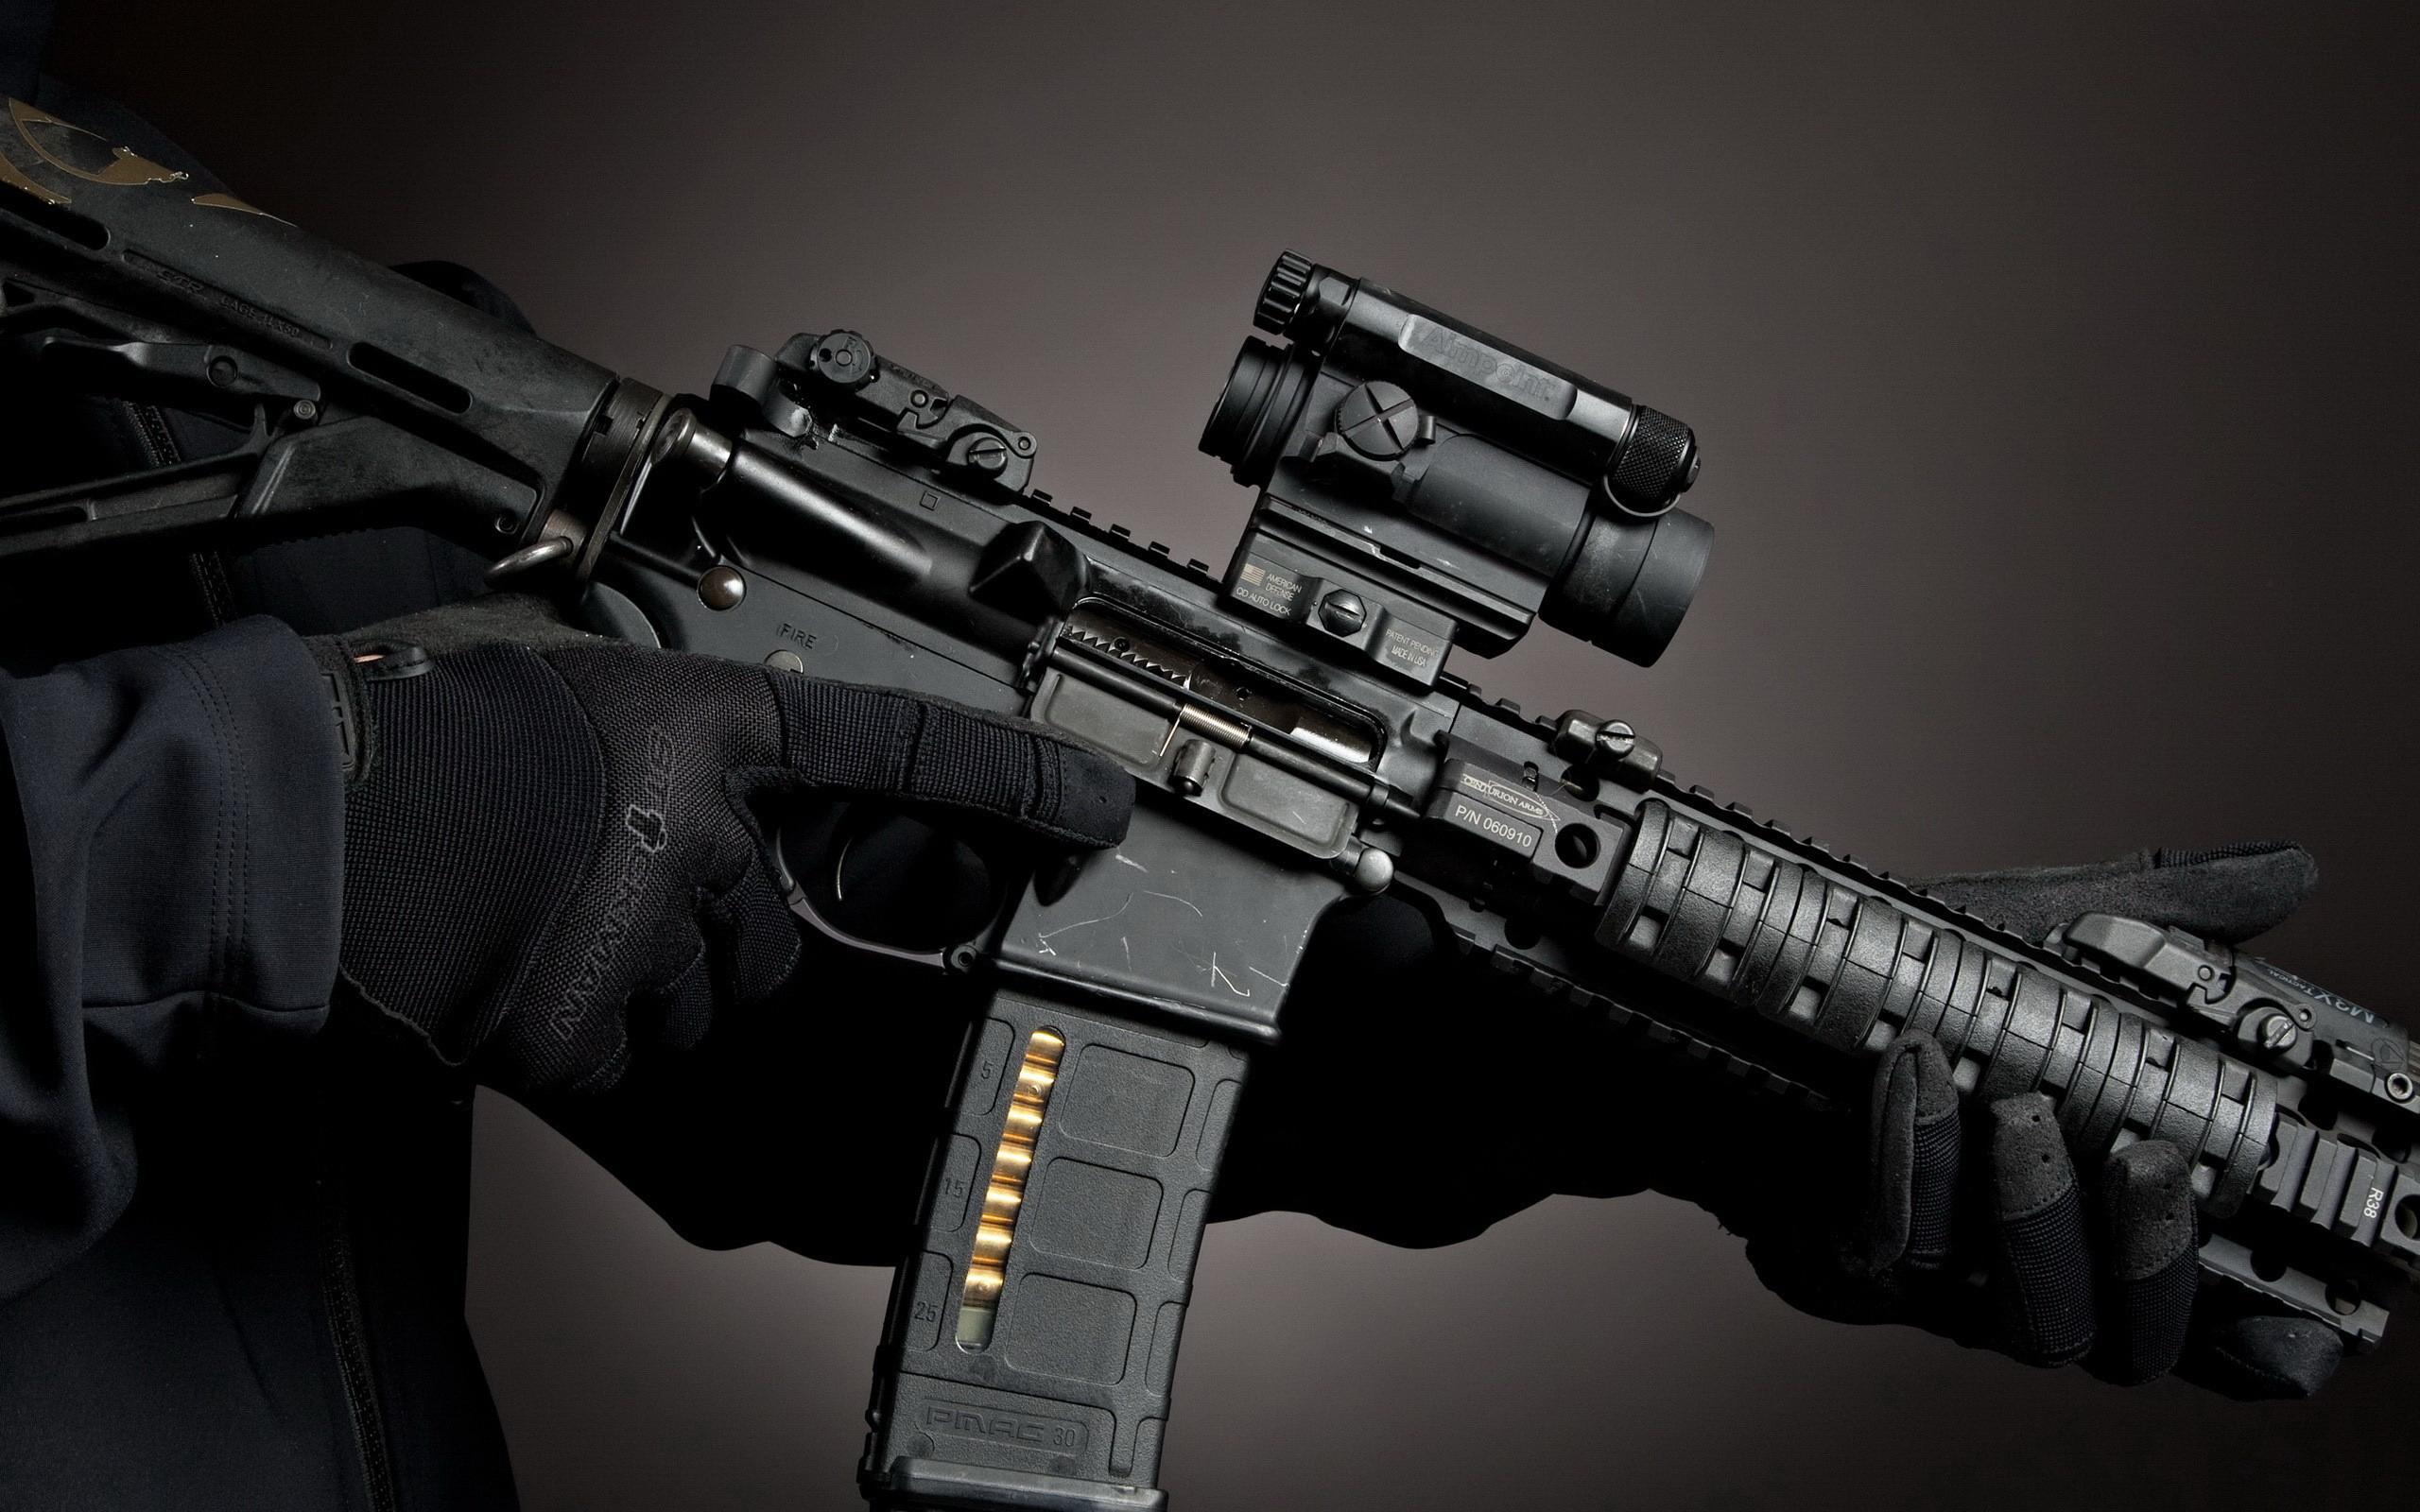 Assault Rifle Wallpapers - WallpaperSafari